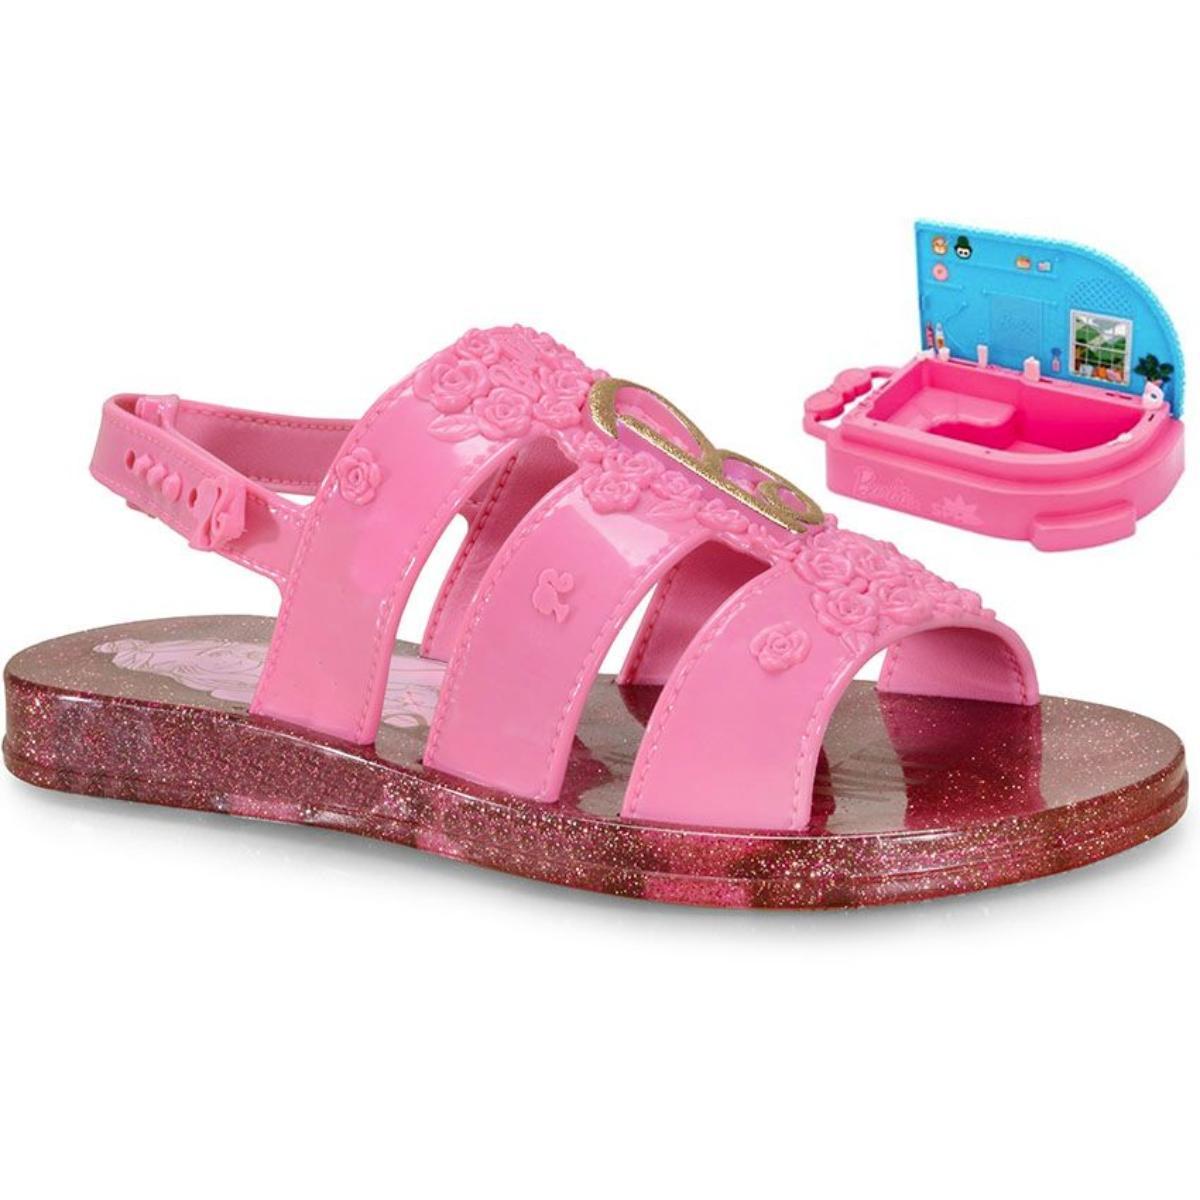 Sandália Fem Infantil Grendene 22485 20197 Barbie Spa Rosa